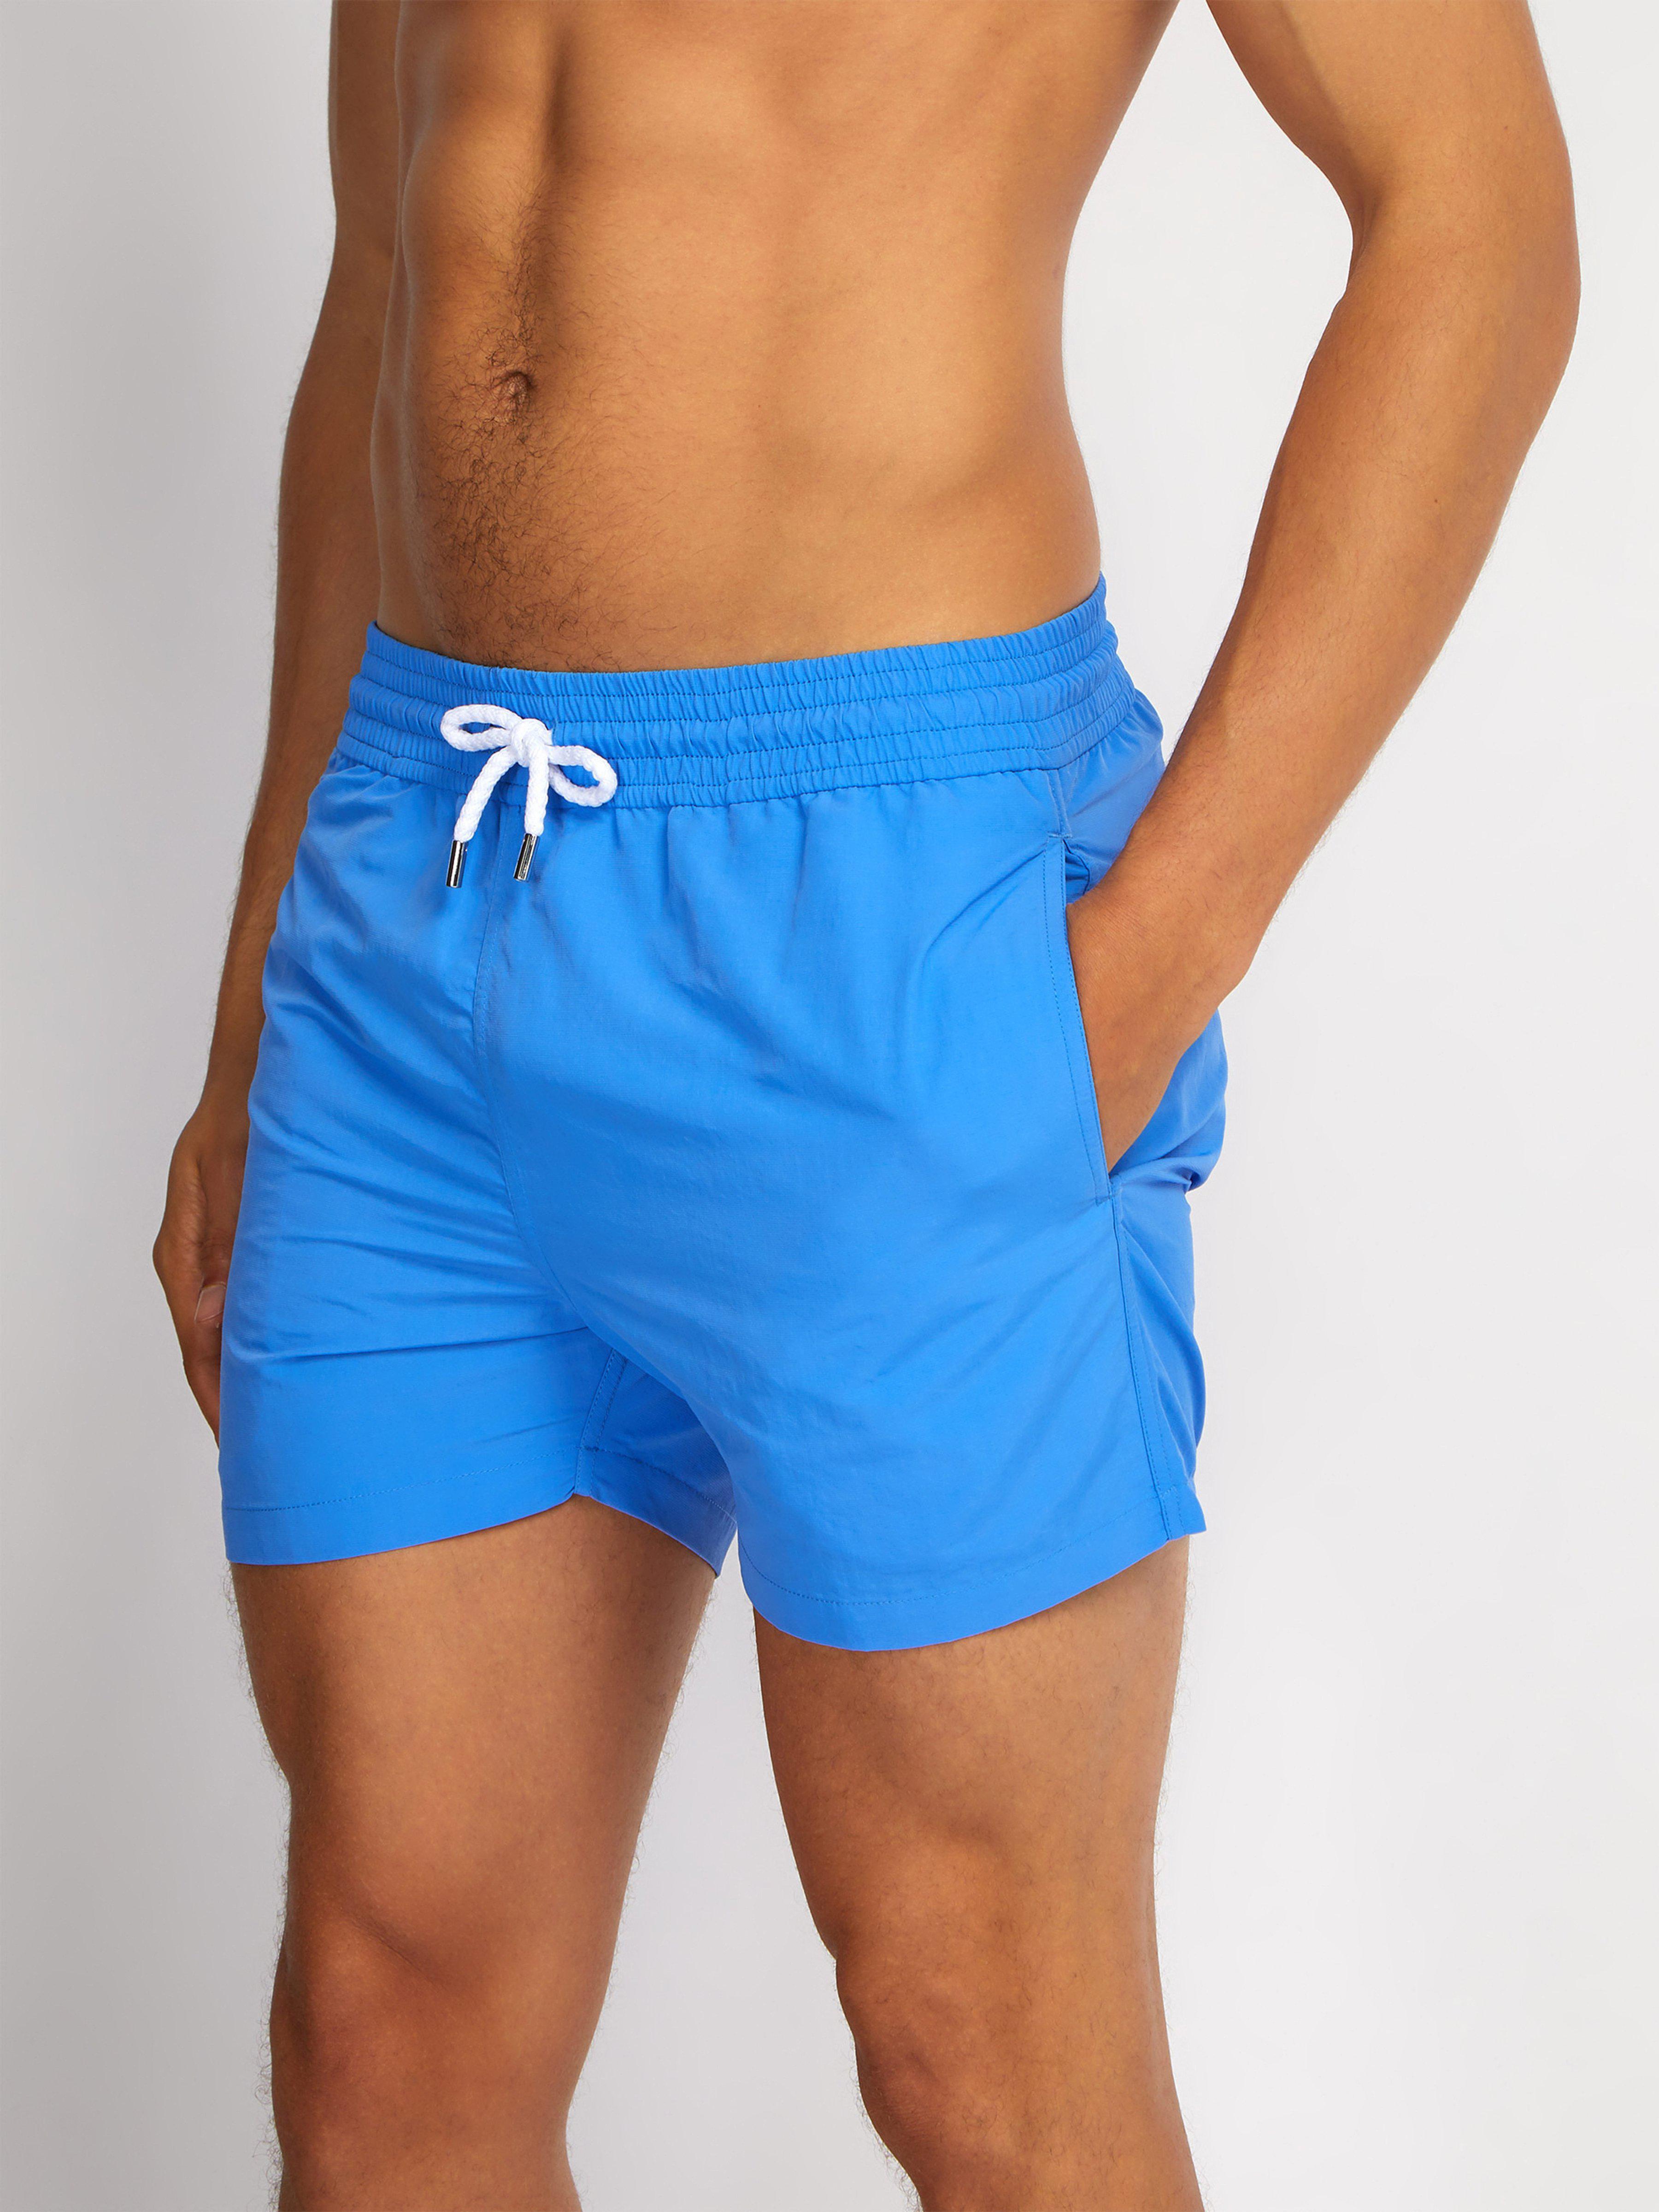 23f3bb3899 Frescobol Carioca Sports Swim Shorts in Blue for Men - Lyst